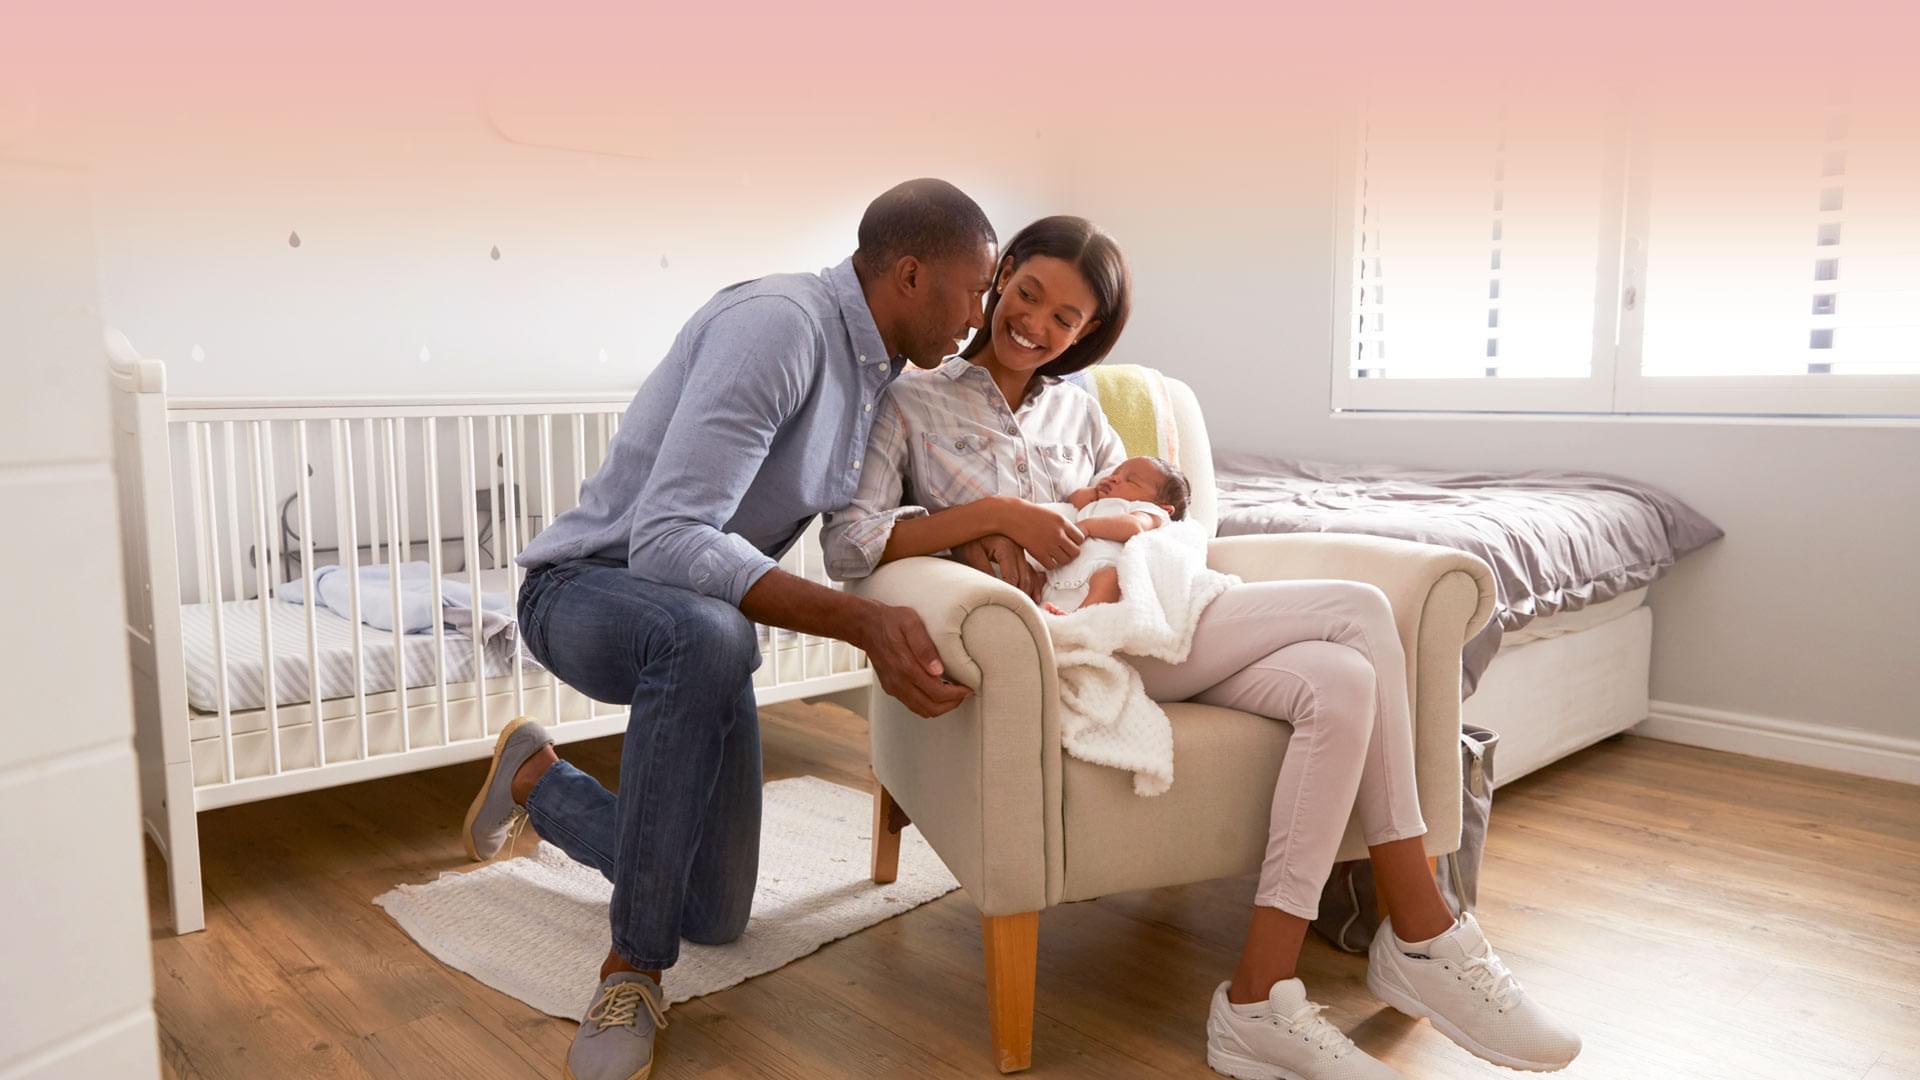 New Home Customer Service & Warranty Information